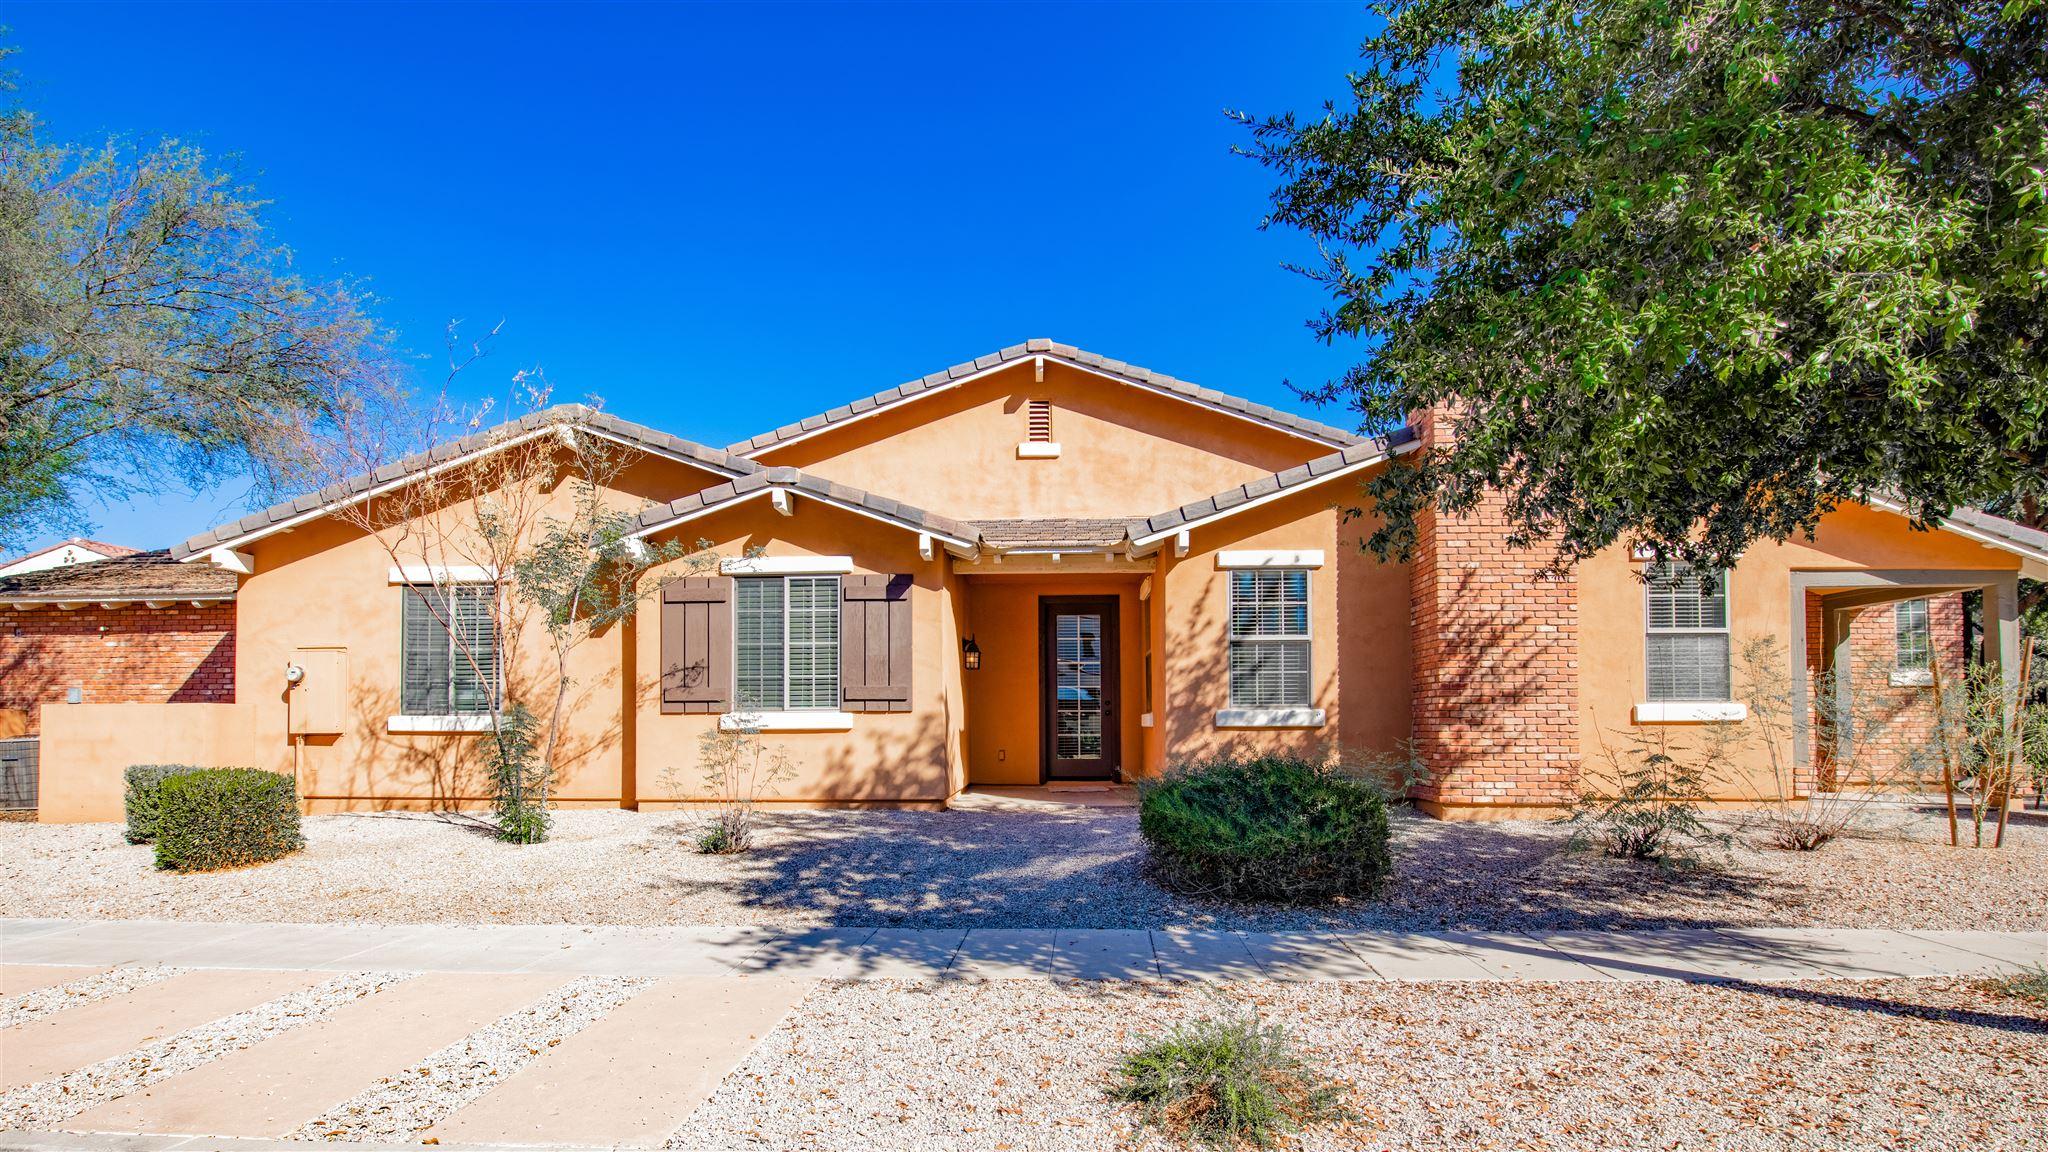 HOT LISTING - 13421 N 151st Drive, Surprise, AZ 85379 - Marley Park | The Amy Jones Group